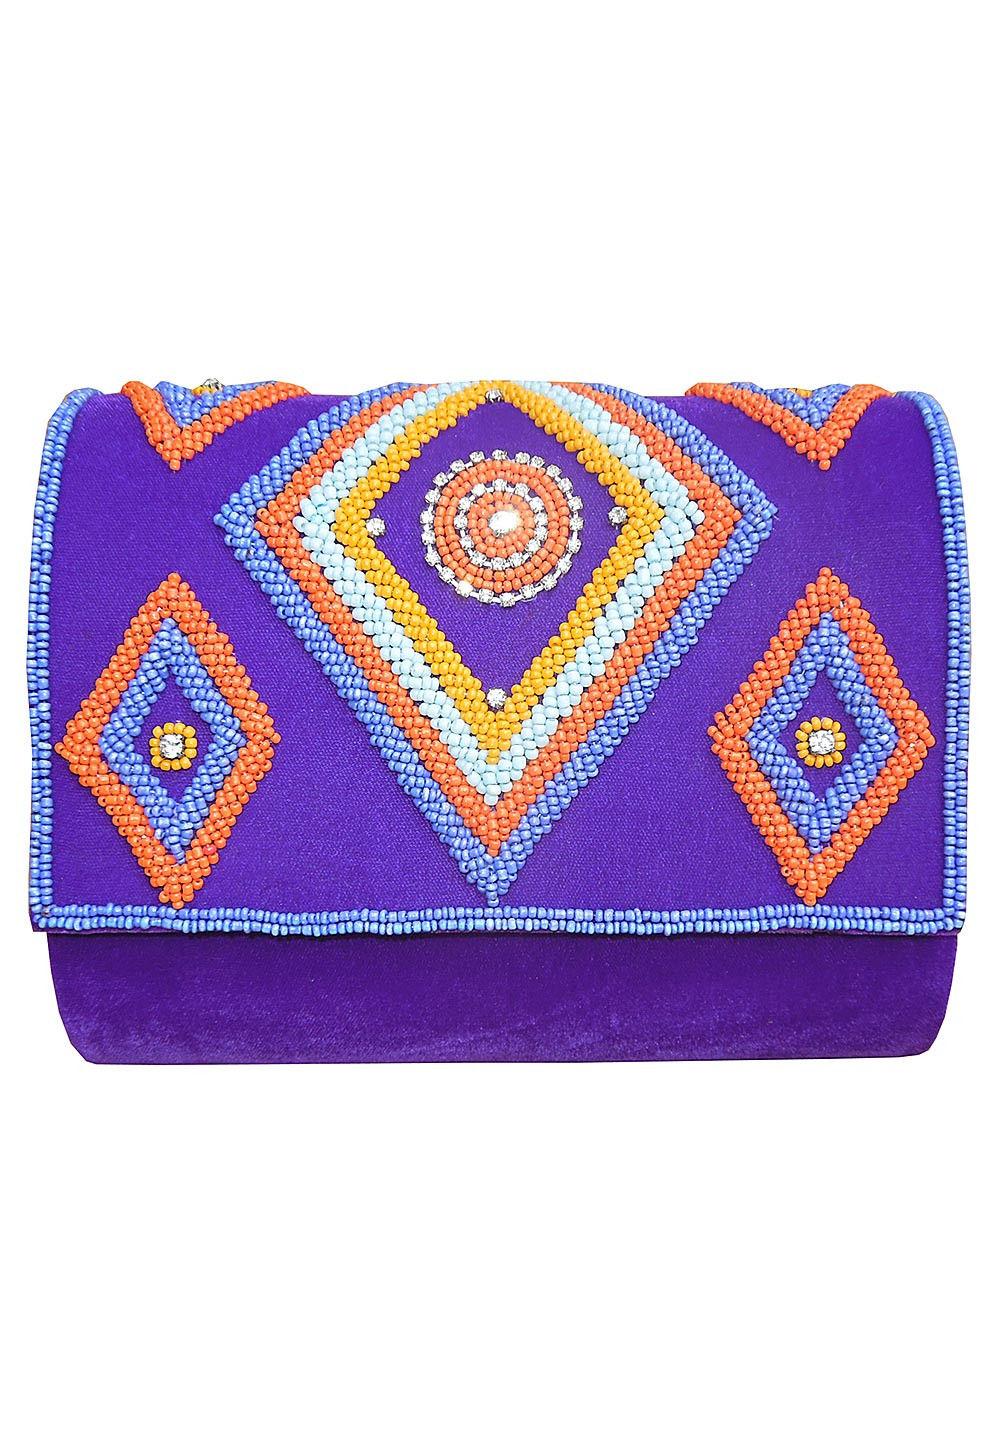 4f30dabd4e93a Hand Embroidered Velvet Flap Clutch Cum Sling Bag in Purple